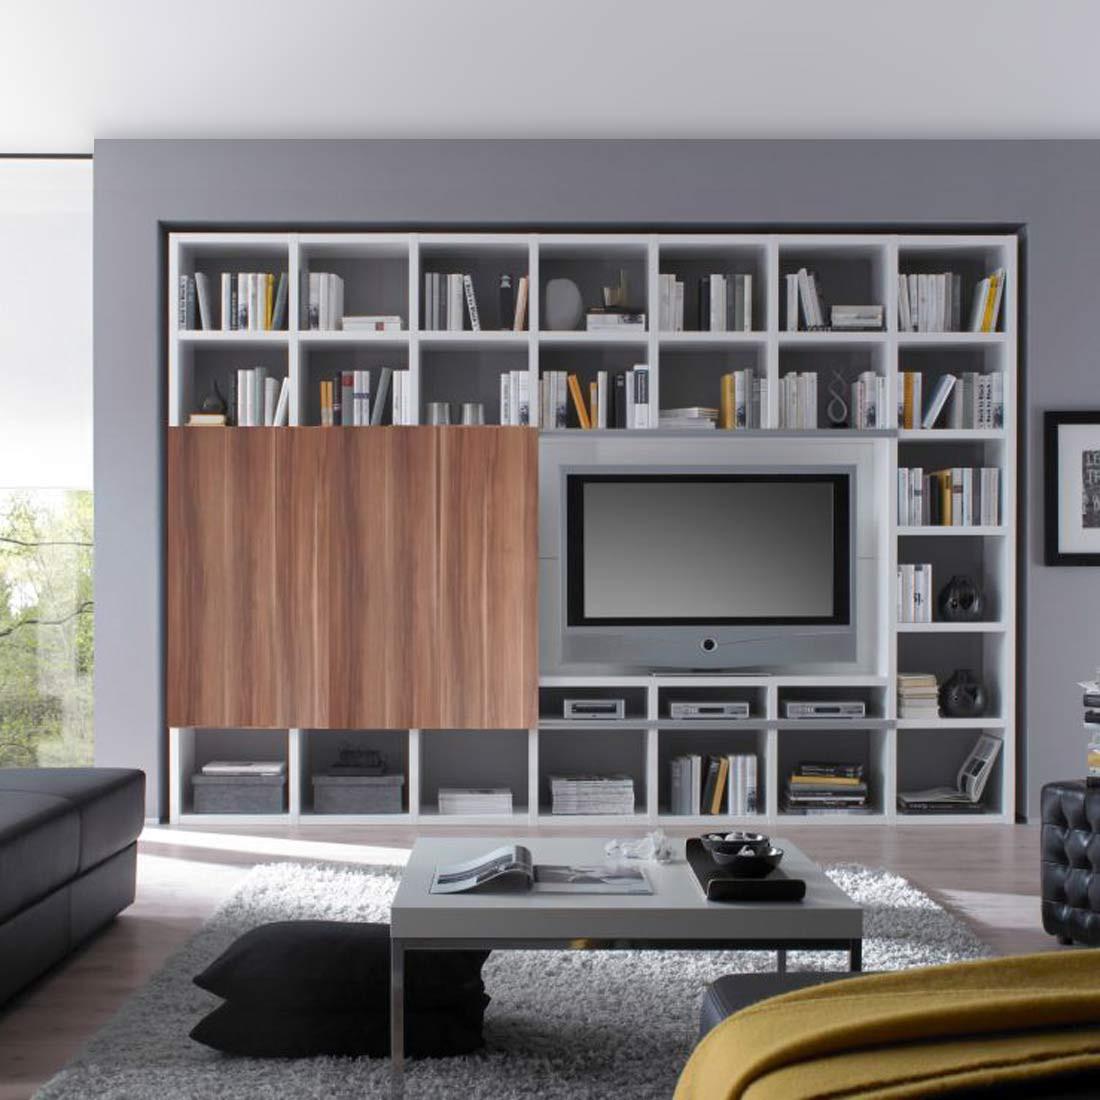 TV-Wand Empire - Hochglanz Weiß / Walnuss Dekor, loftscape